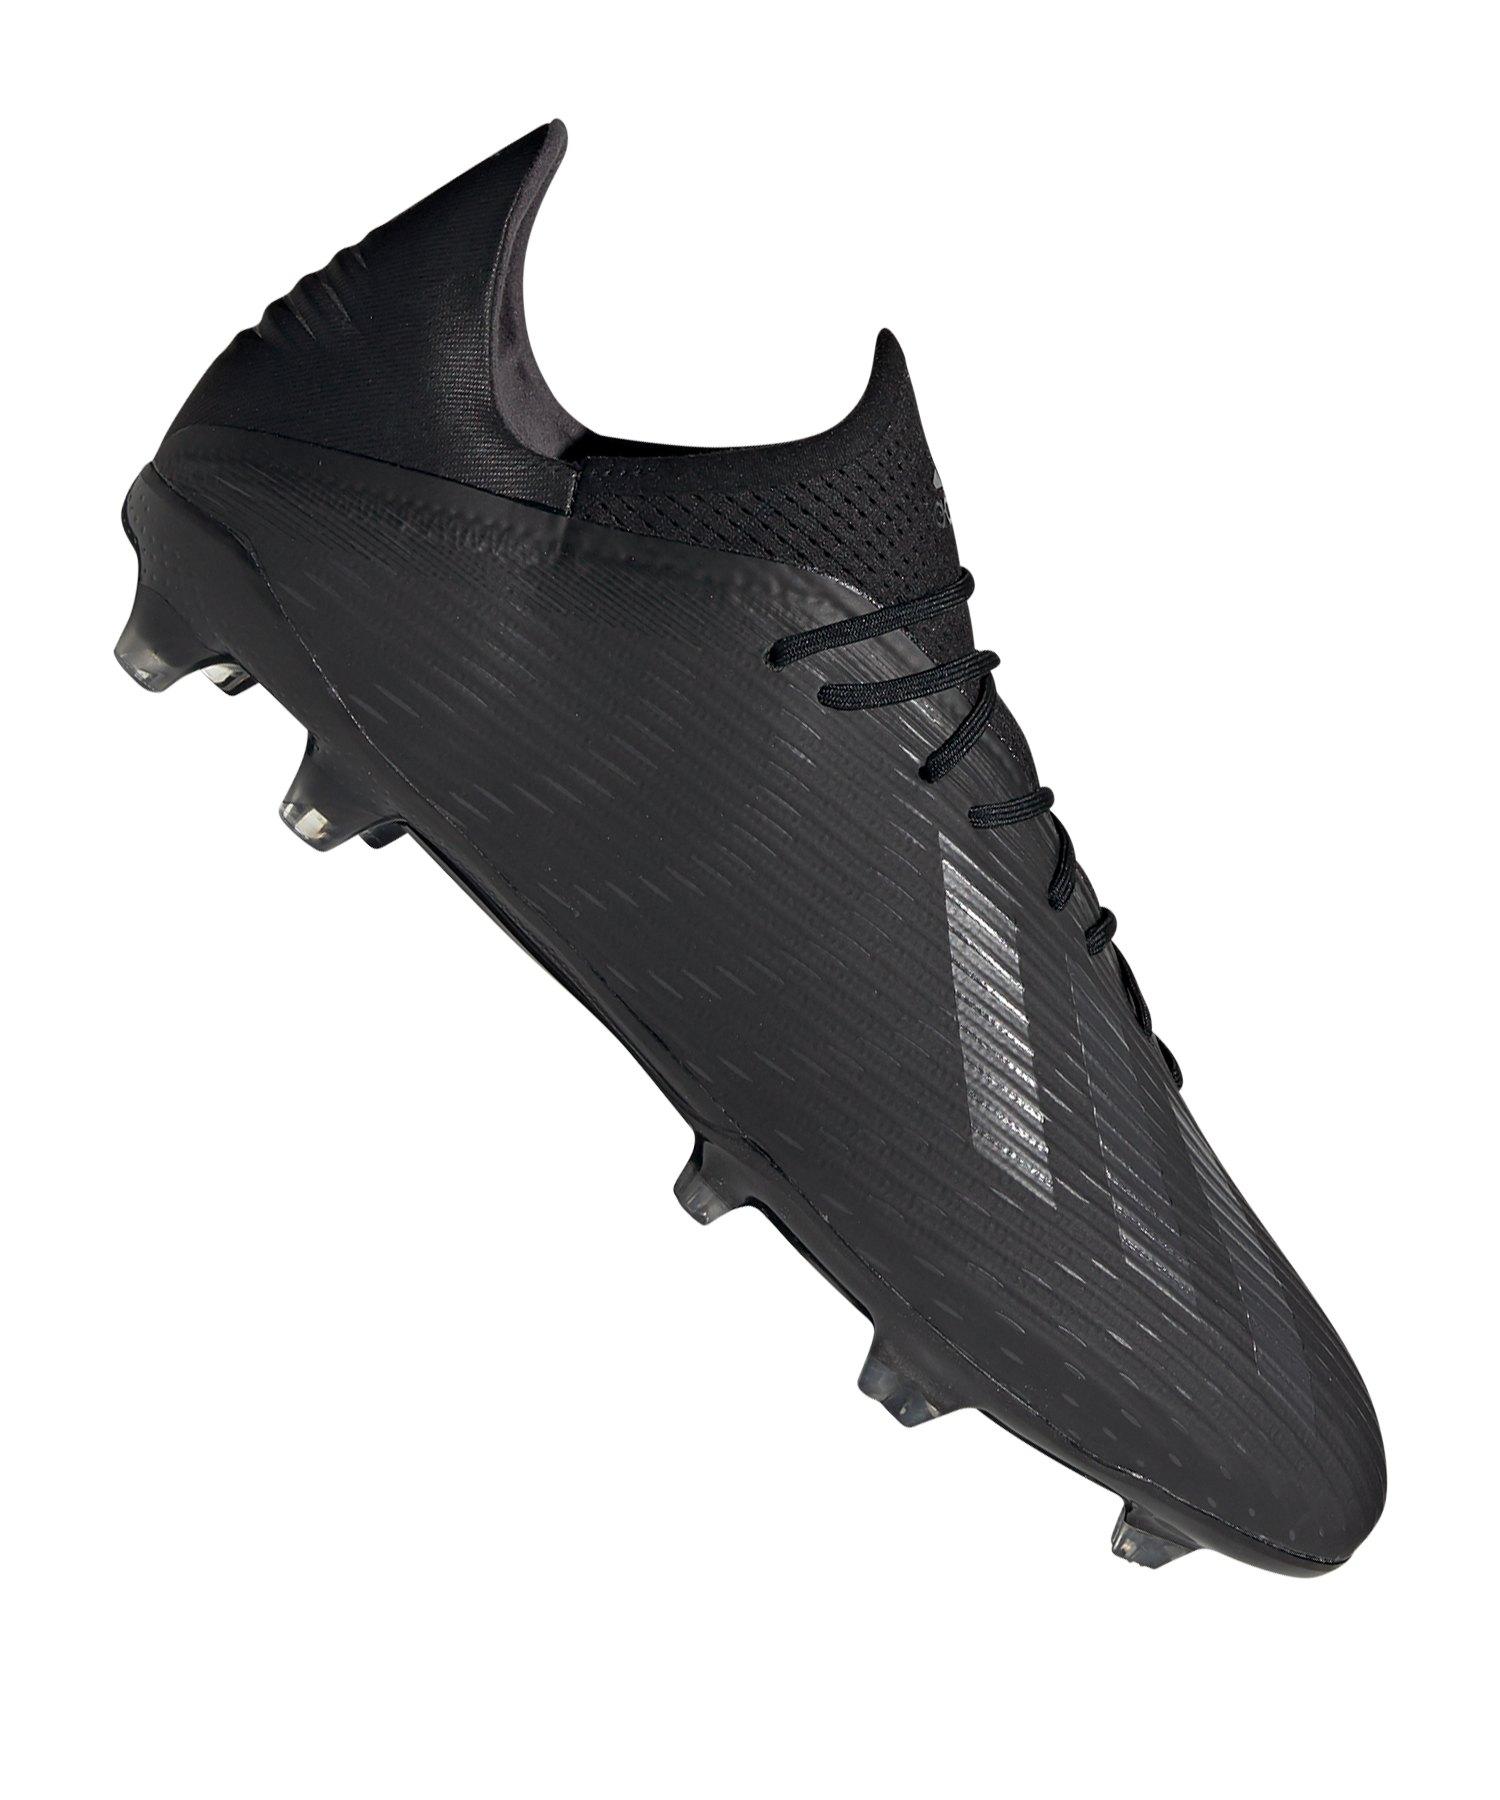 adidas X 19.2 FG Schwarz - schwarz